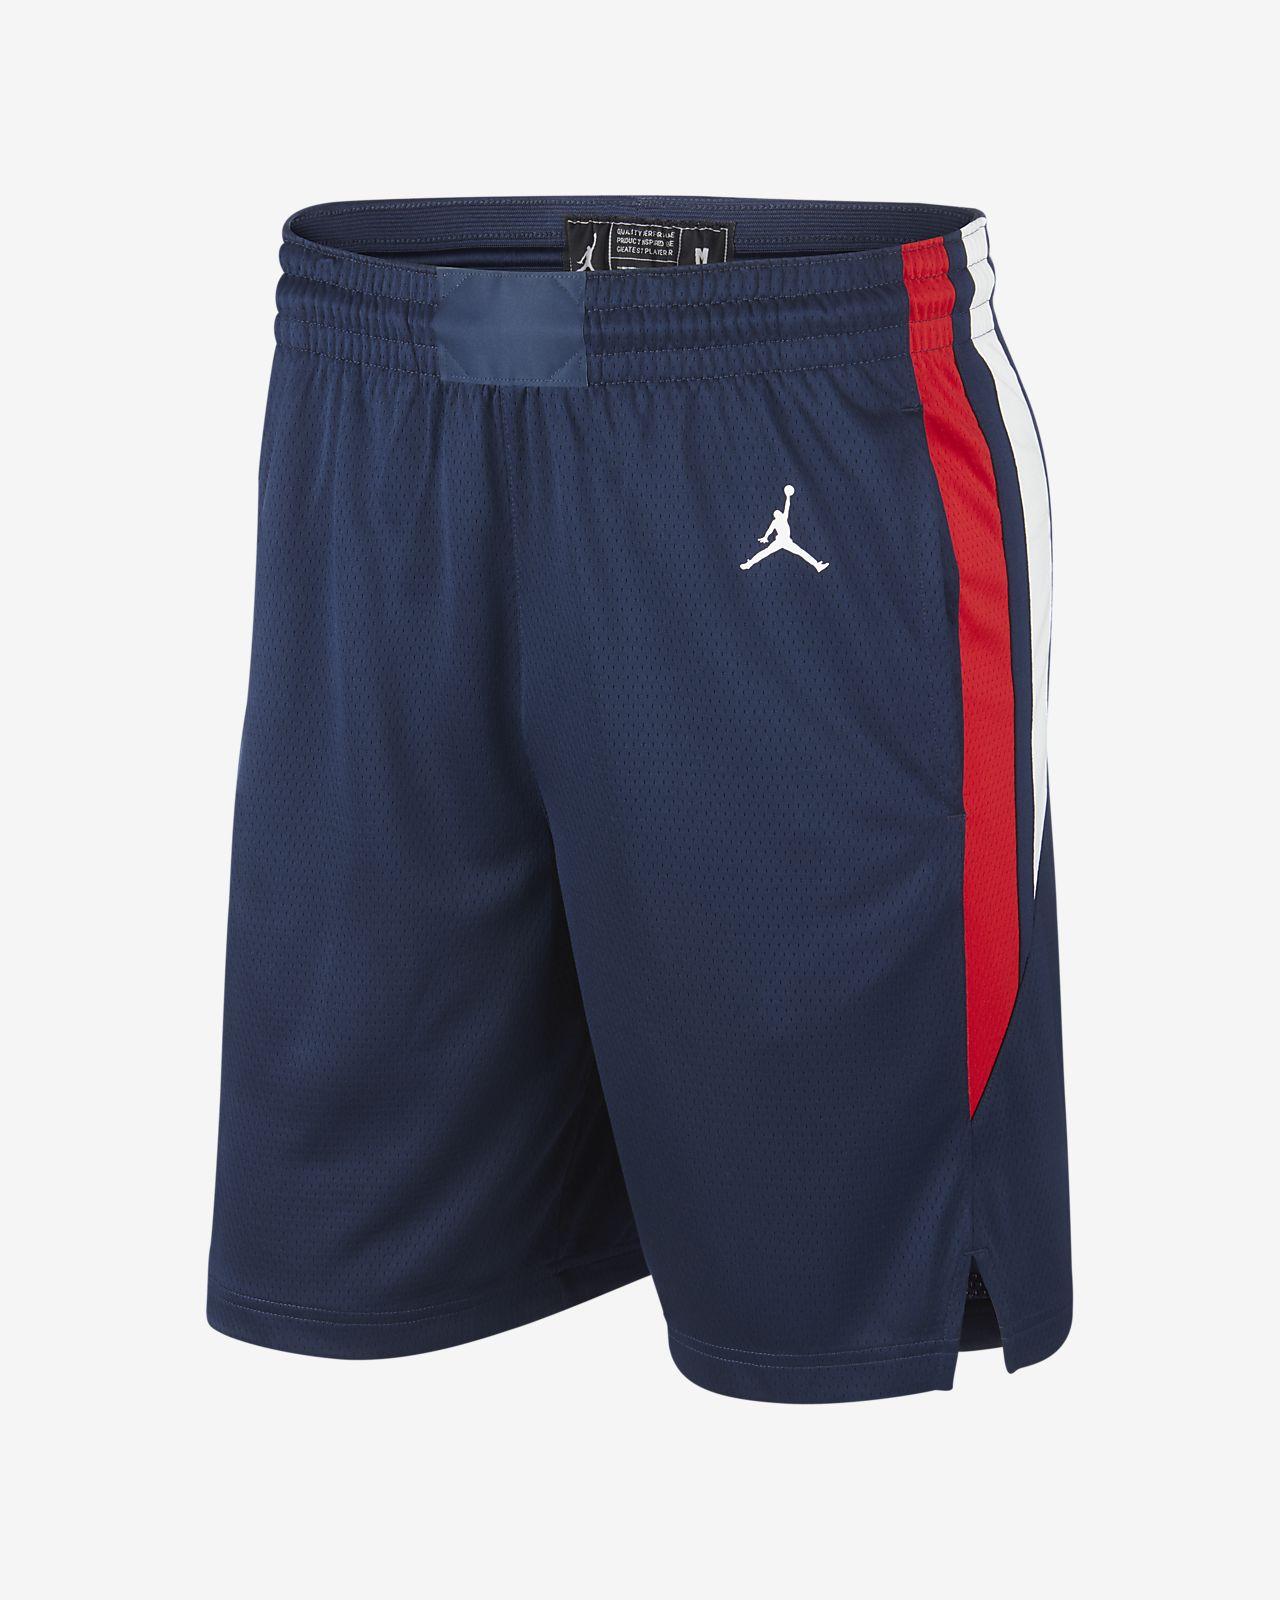 France Jordan Men's Basketball Shorts